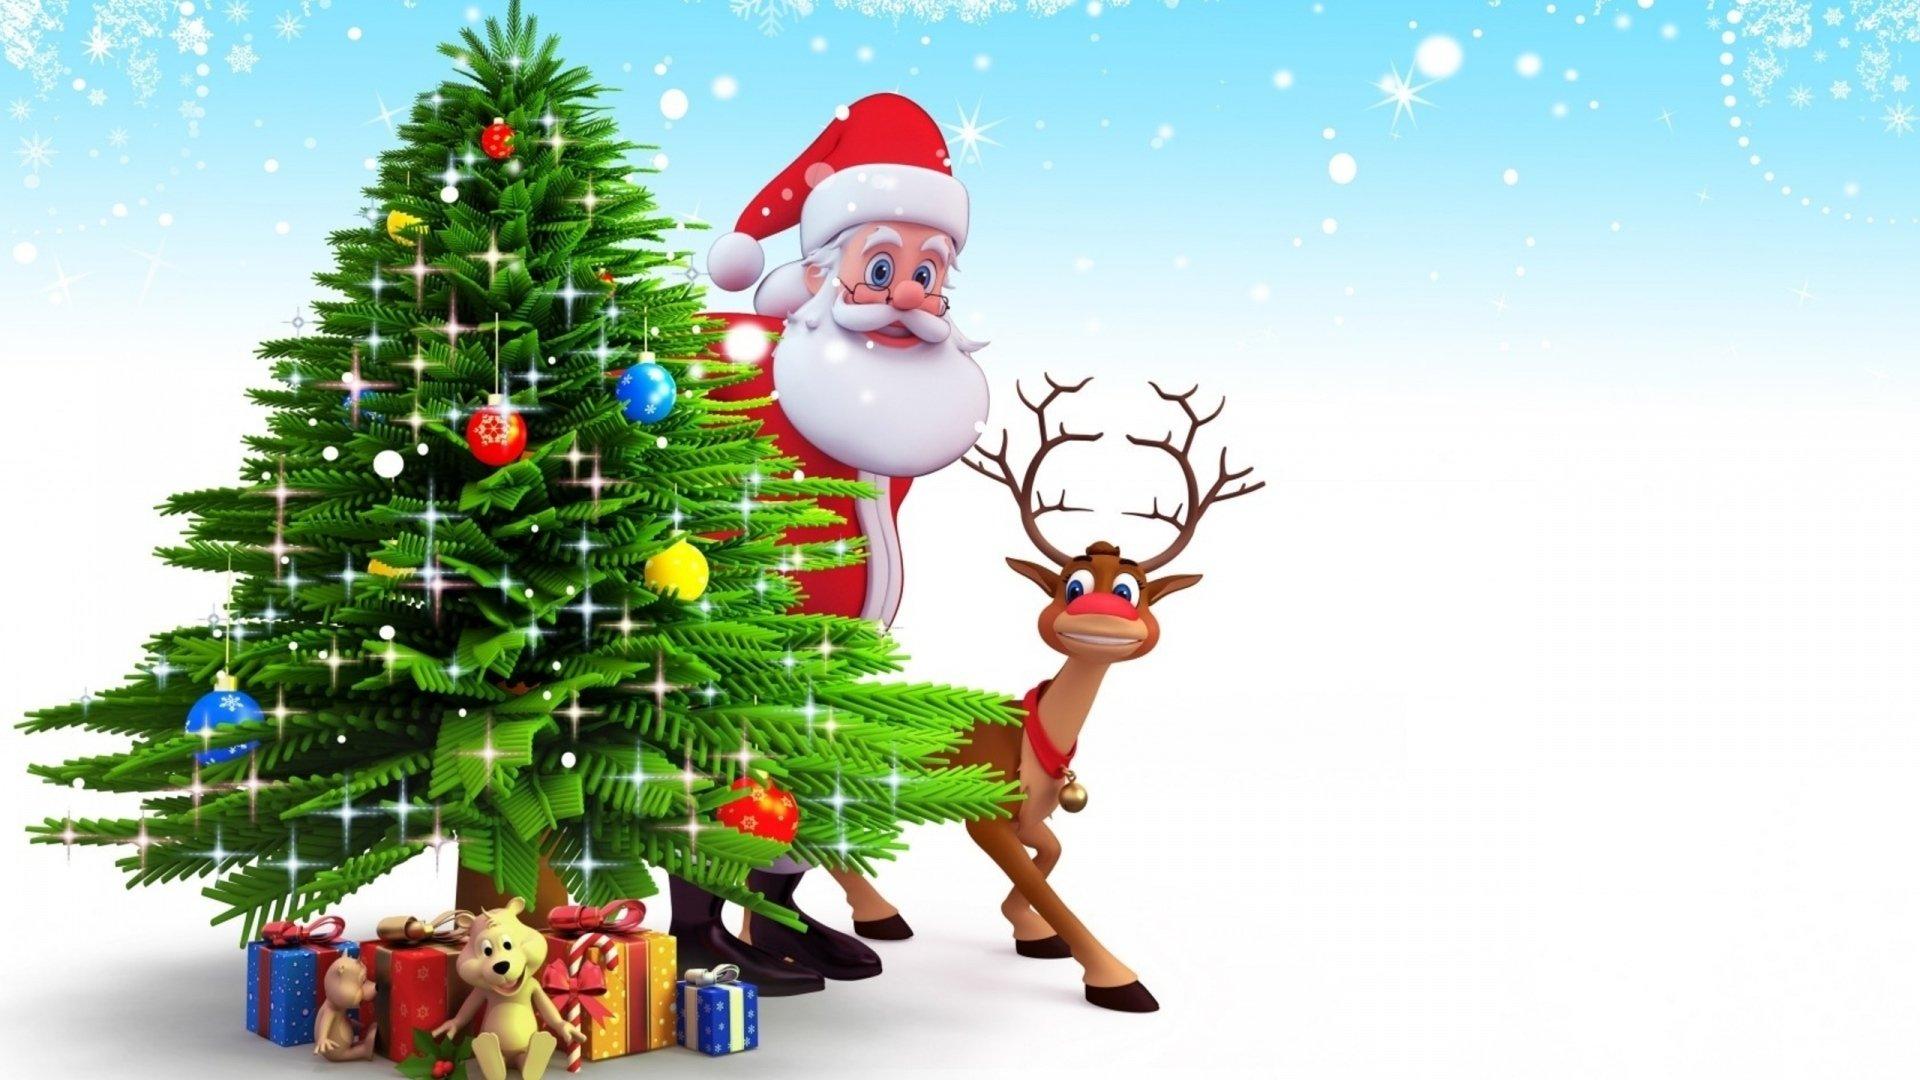 Holiday - Christmas  Christmas Tree Santa Claus Reindeer Gift Wallpaper